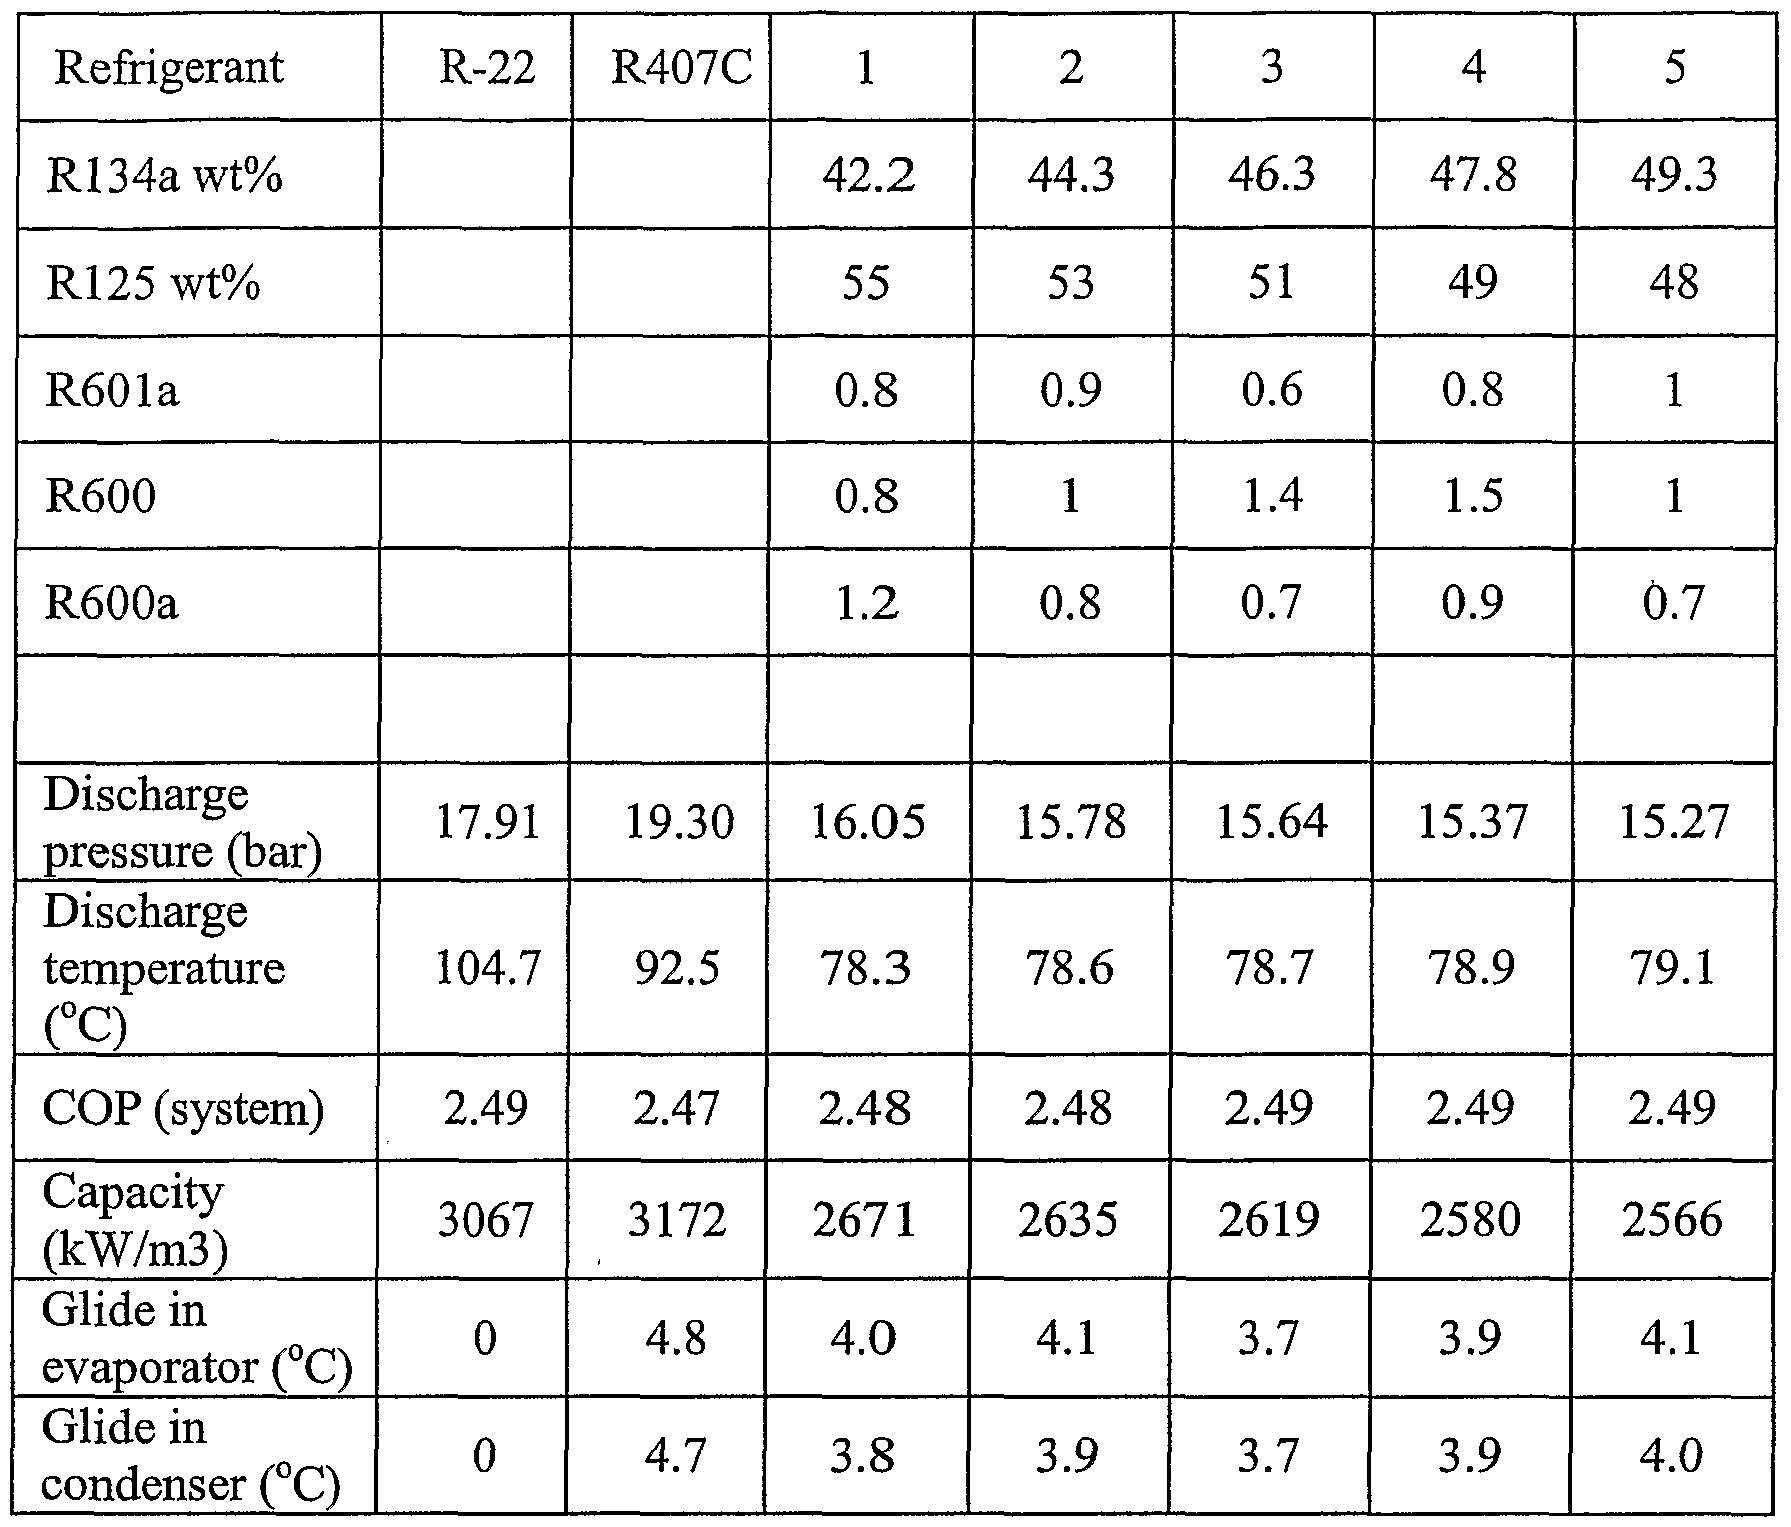 r22 refrigerant replacement comparison essay